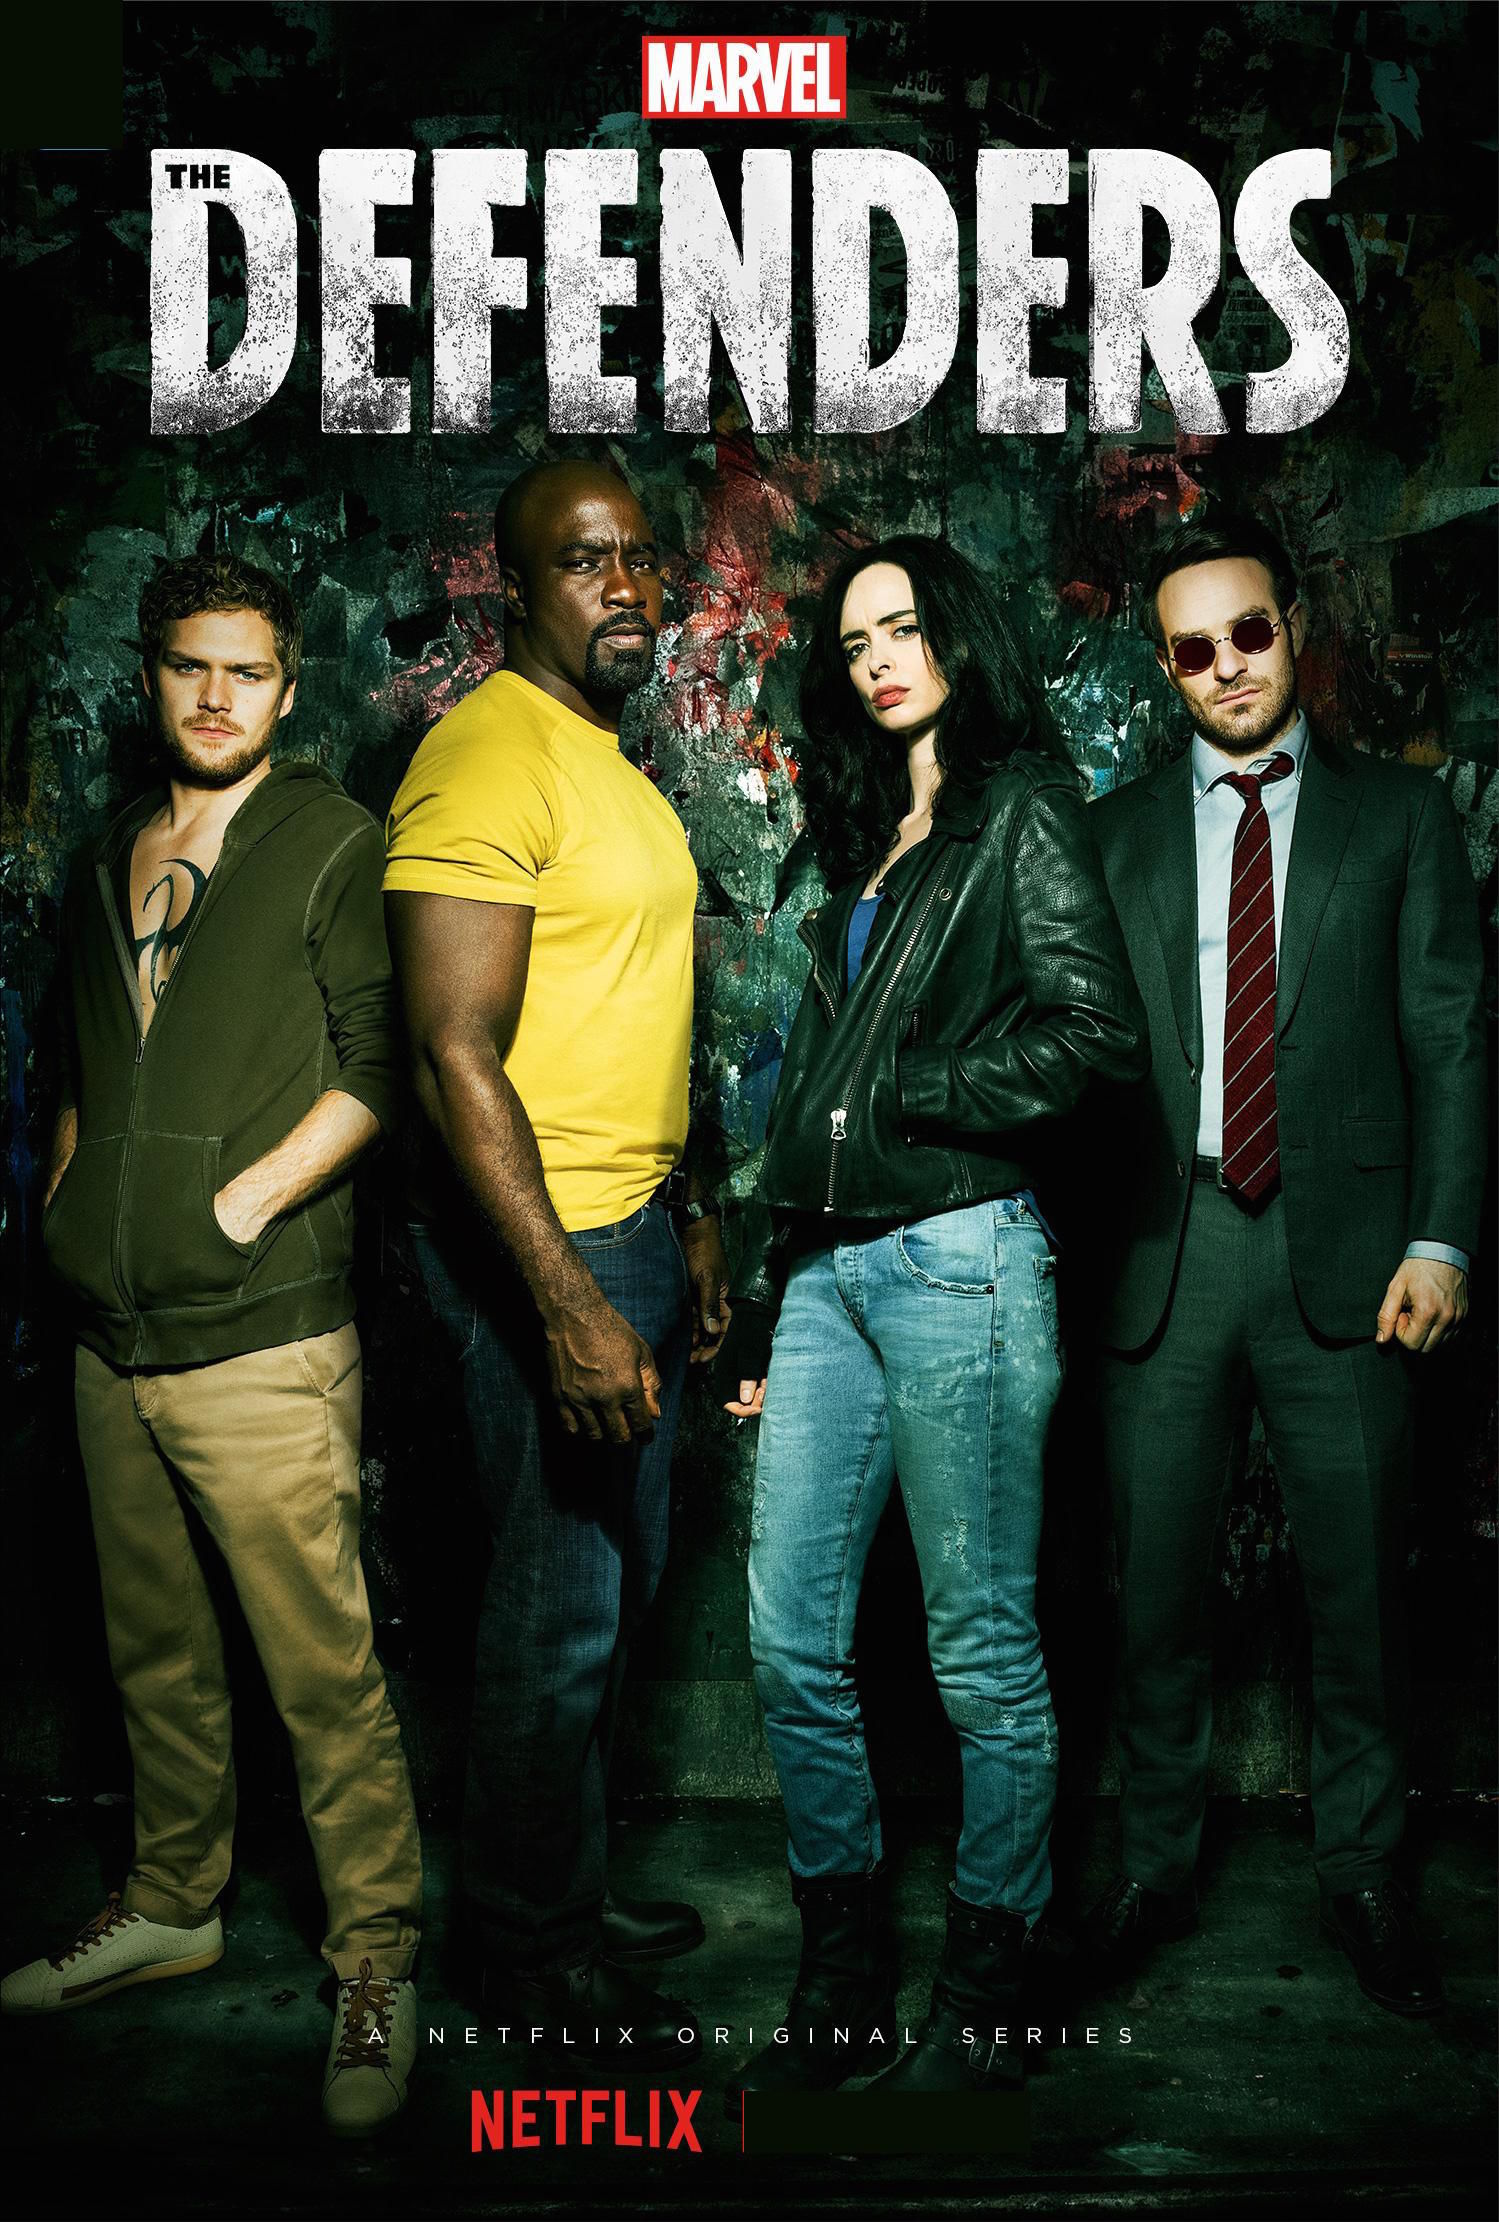 Marvel's The Defenders ne zaman